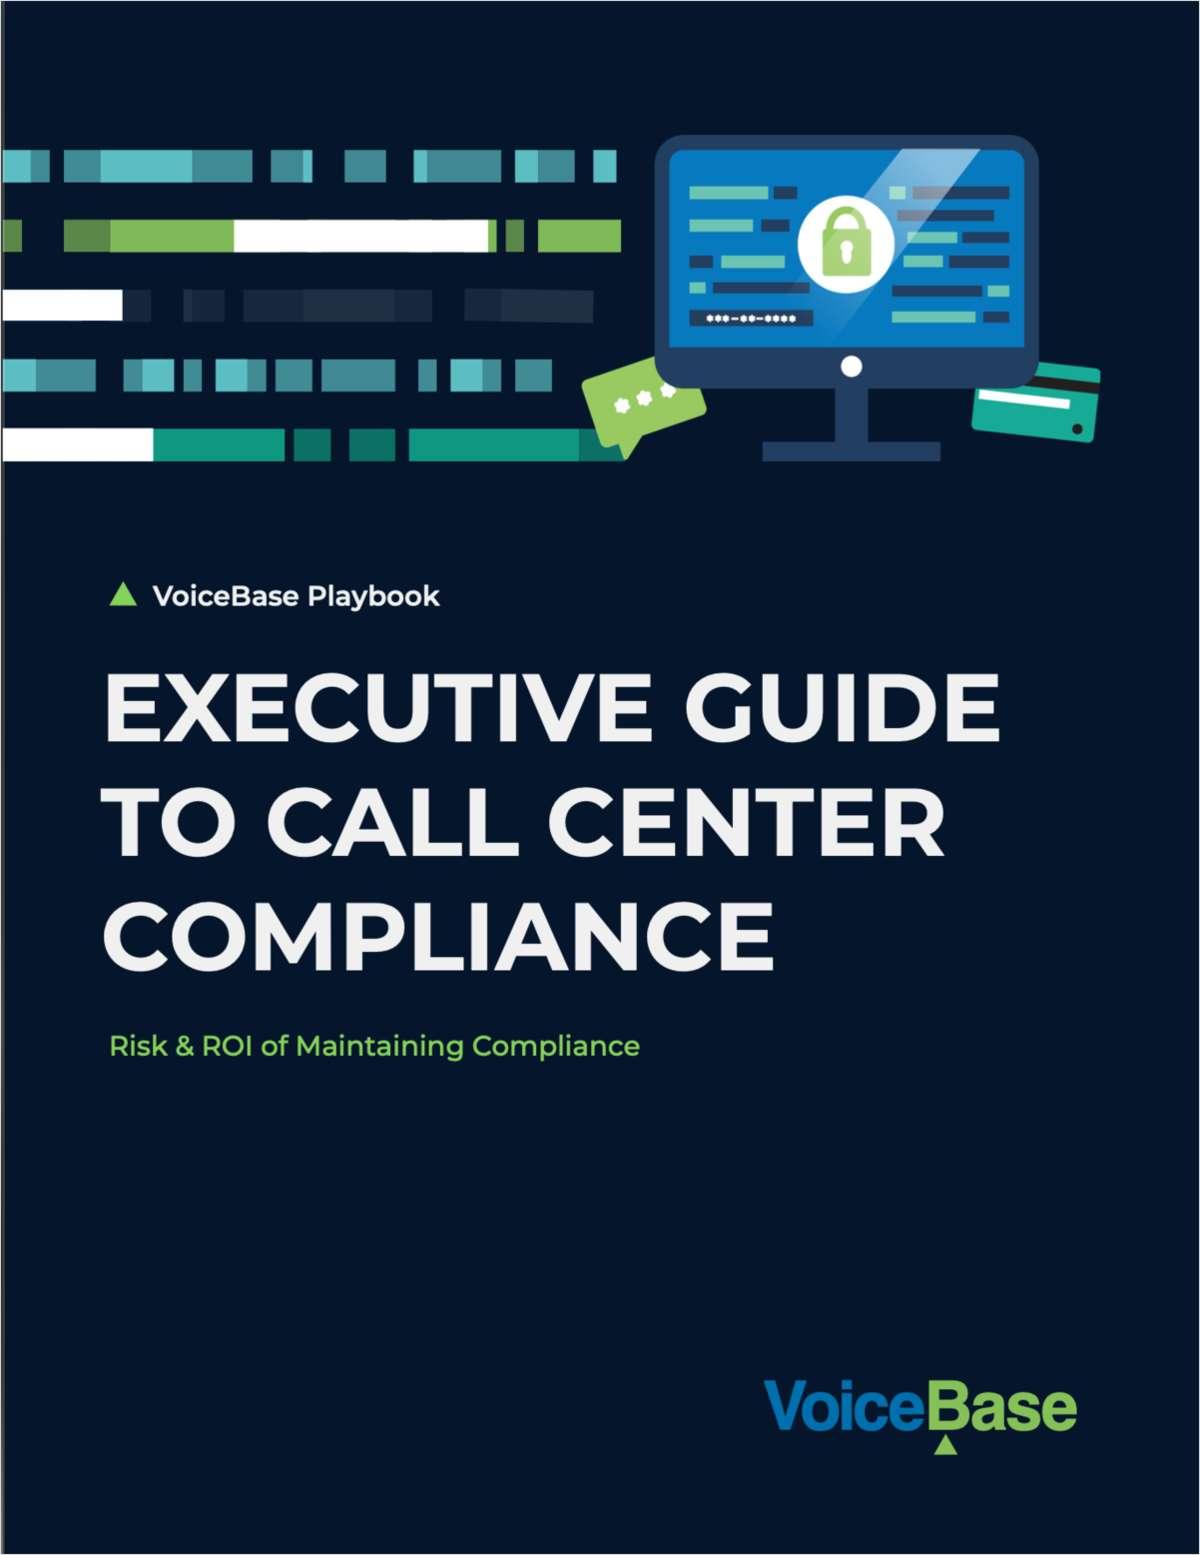 Executive Guide to Call Center Compliance